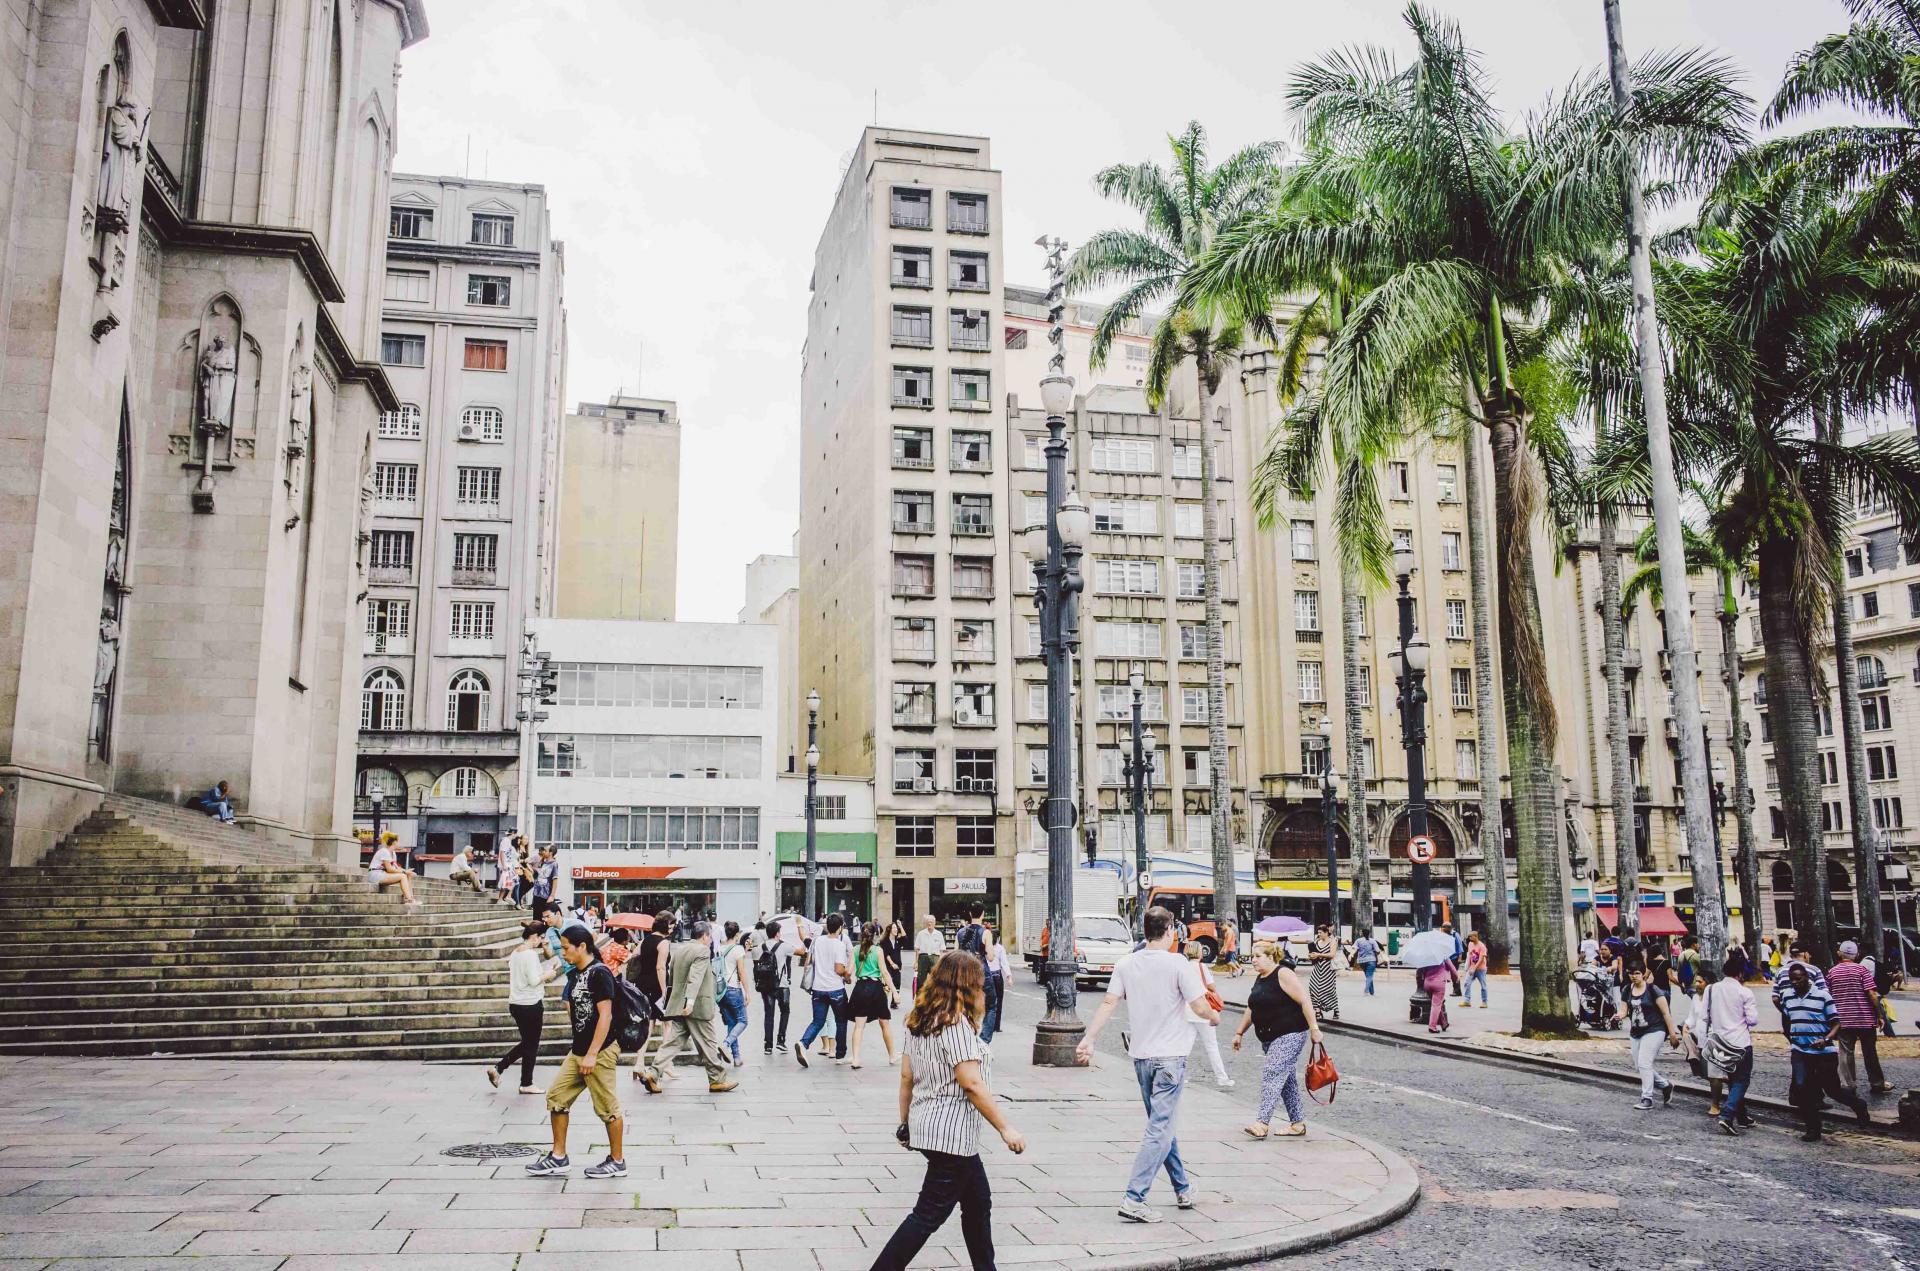 Belebter Platz in Sao Paulo